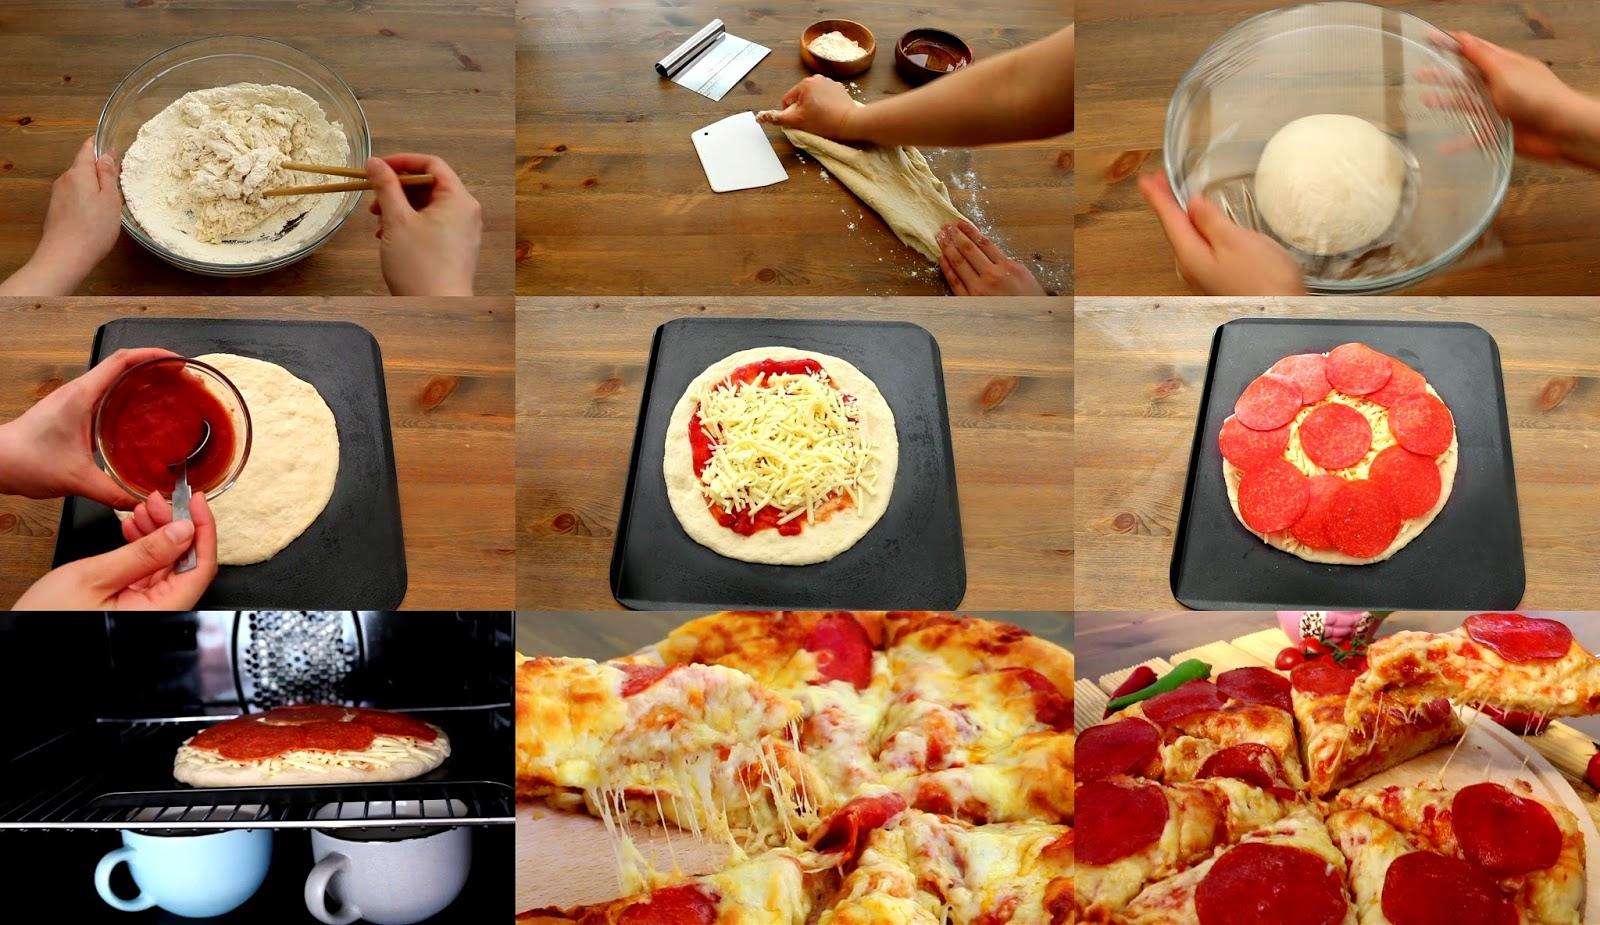 Josephine S Recipes Homemade Pepperoni Pizza